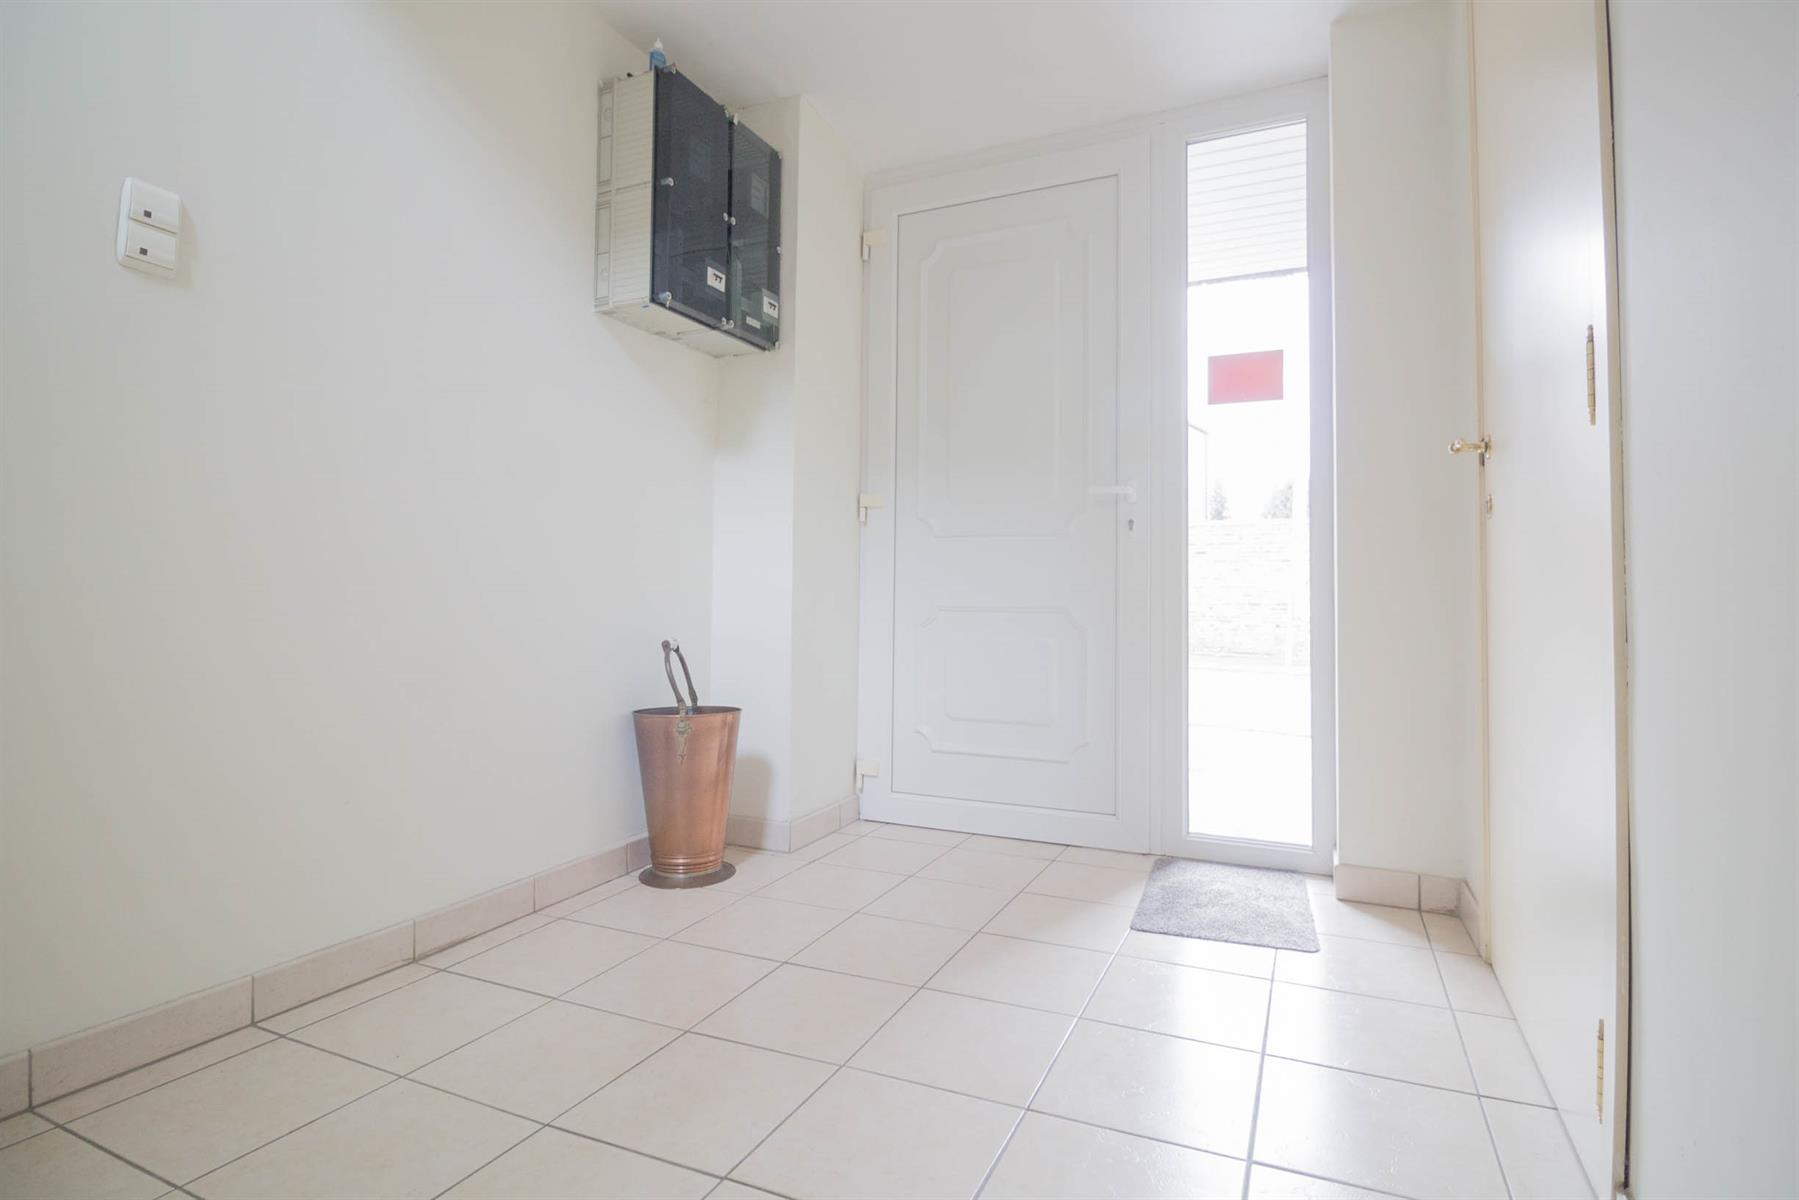 Appartement - Trazegnies - #4359277-3